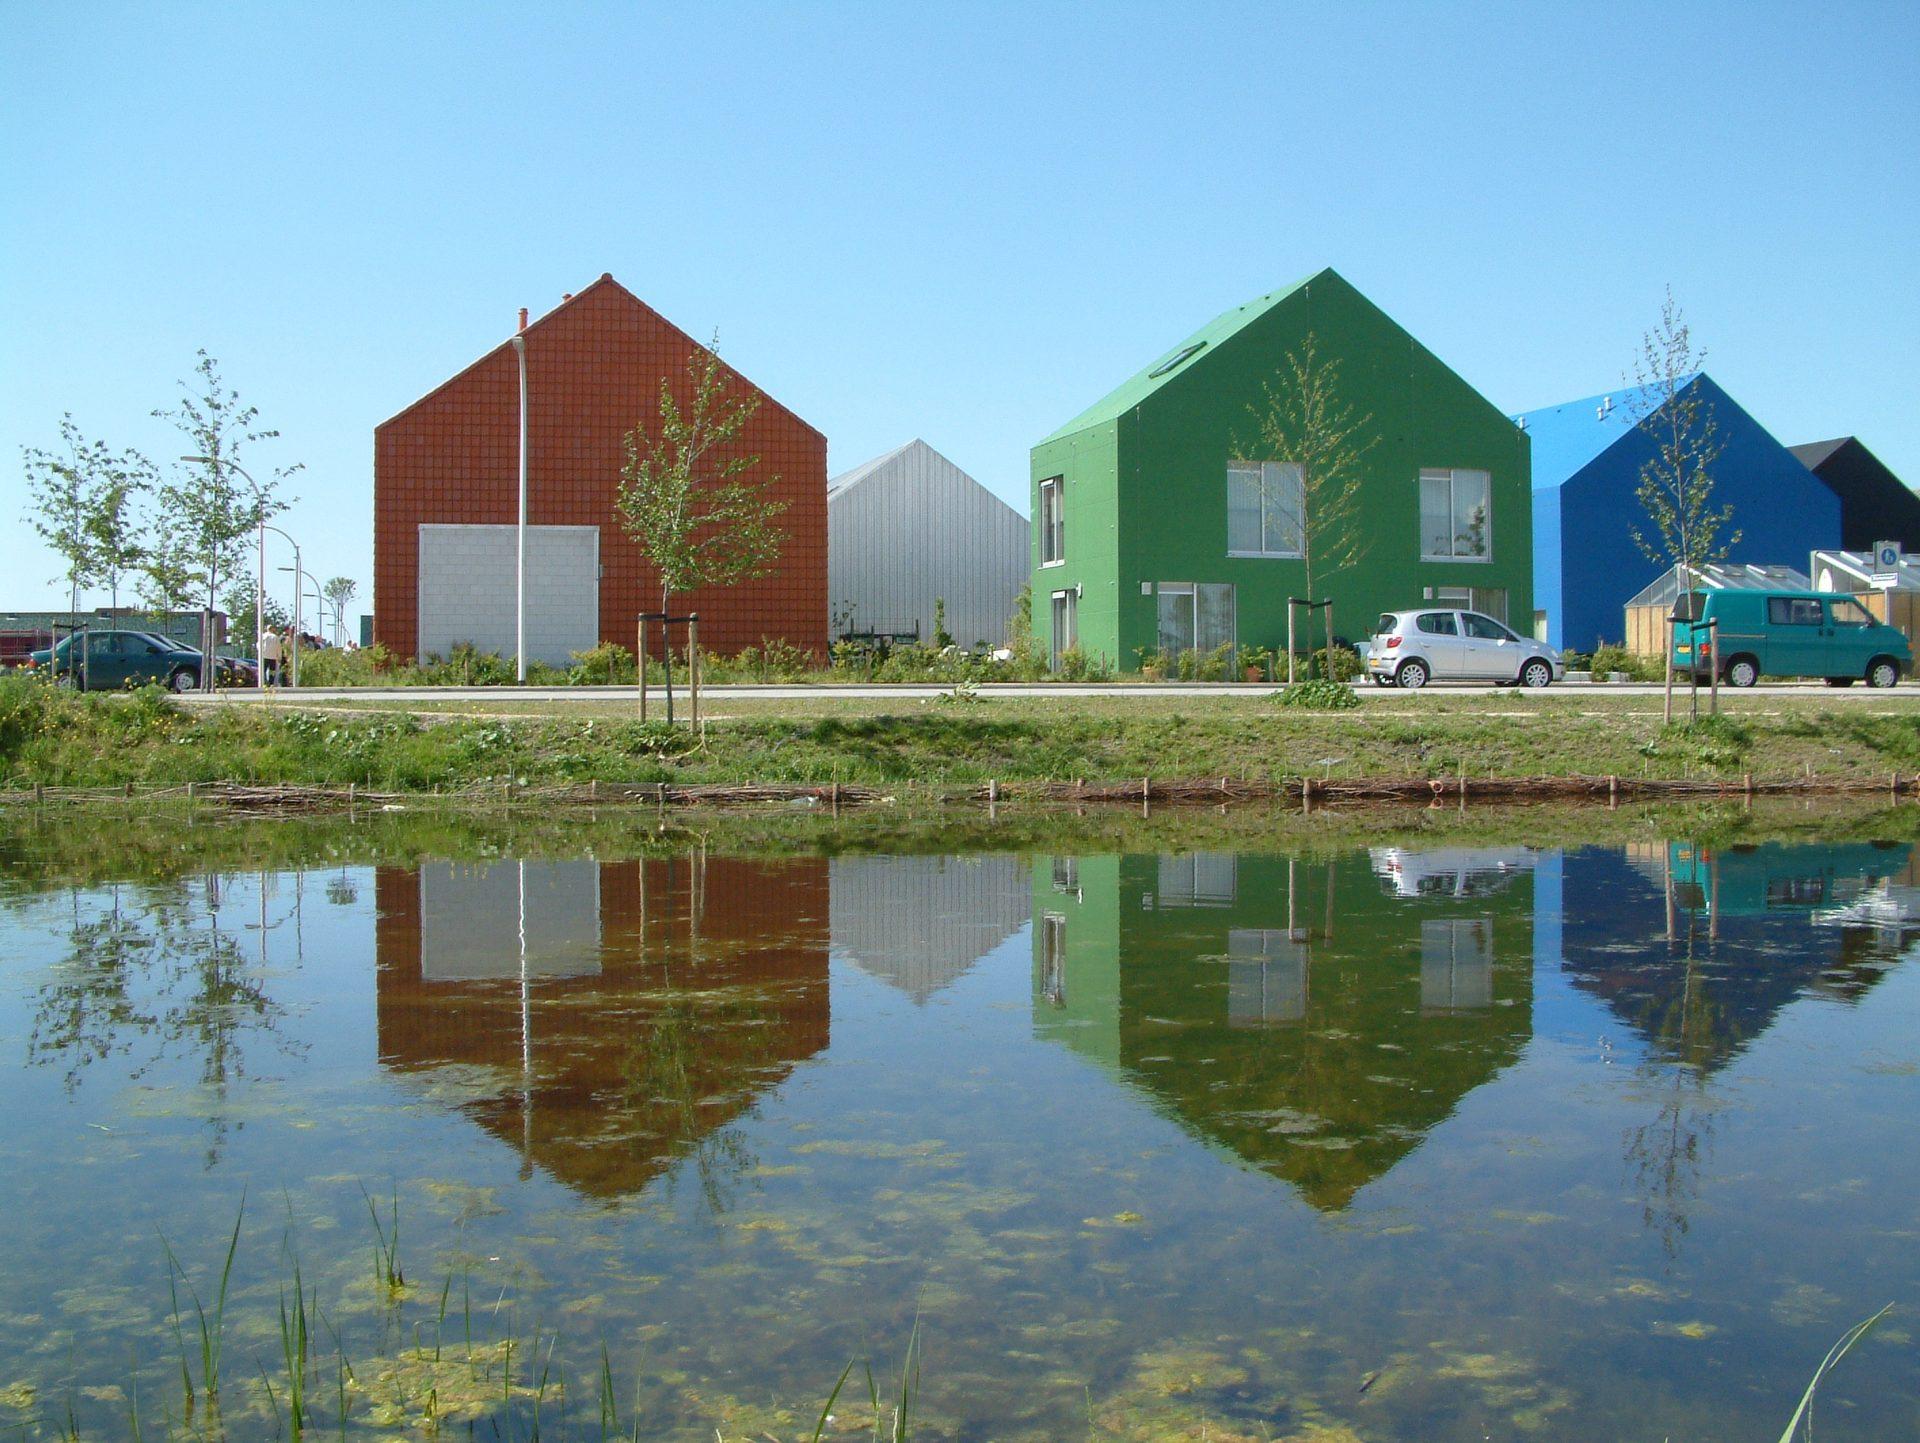 Hageneiland, Den Haag